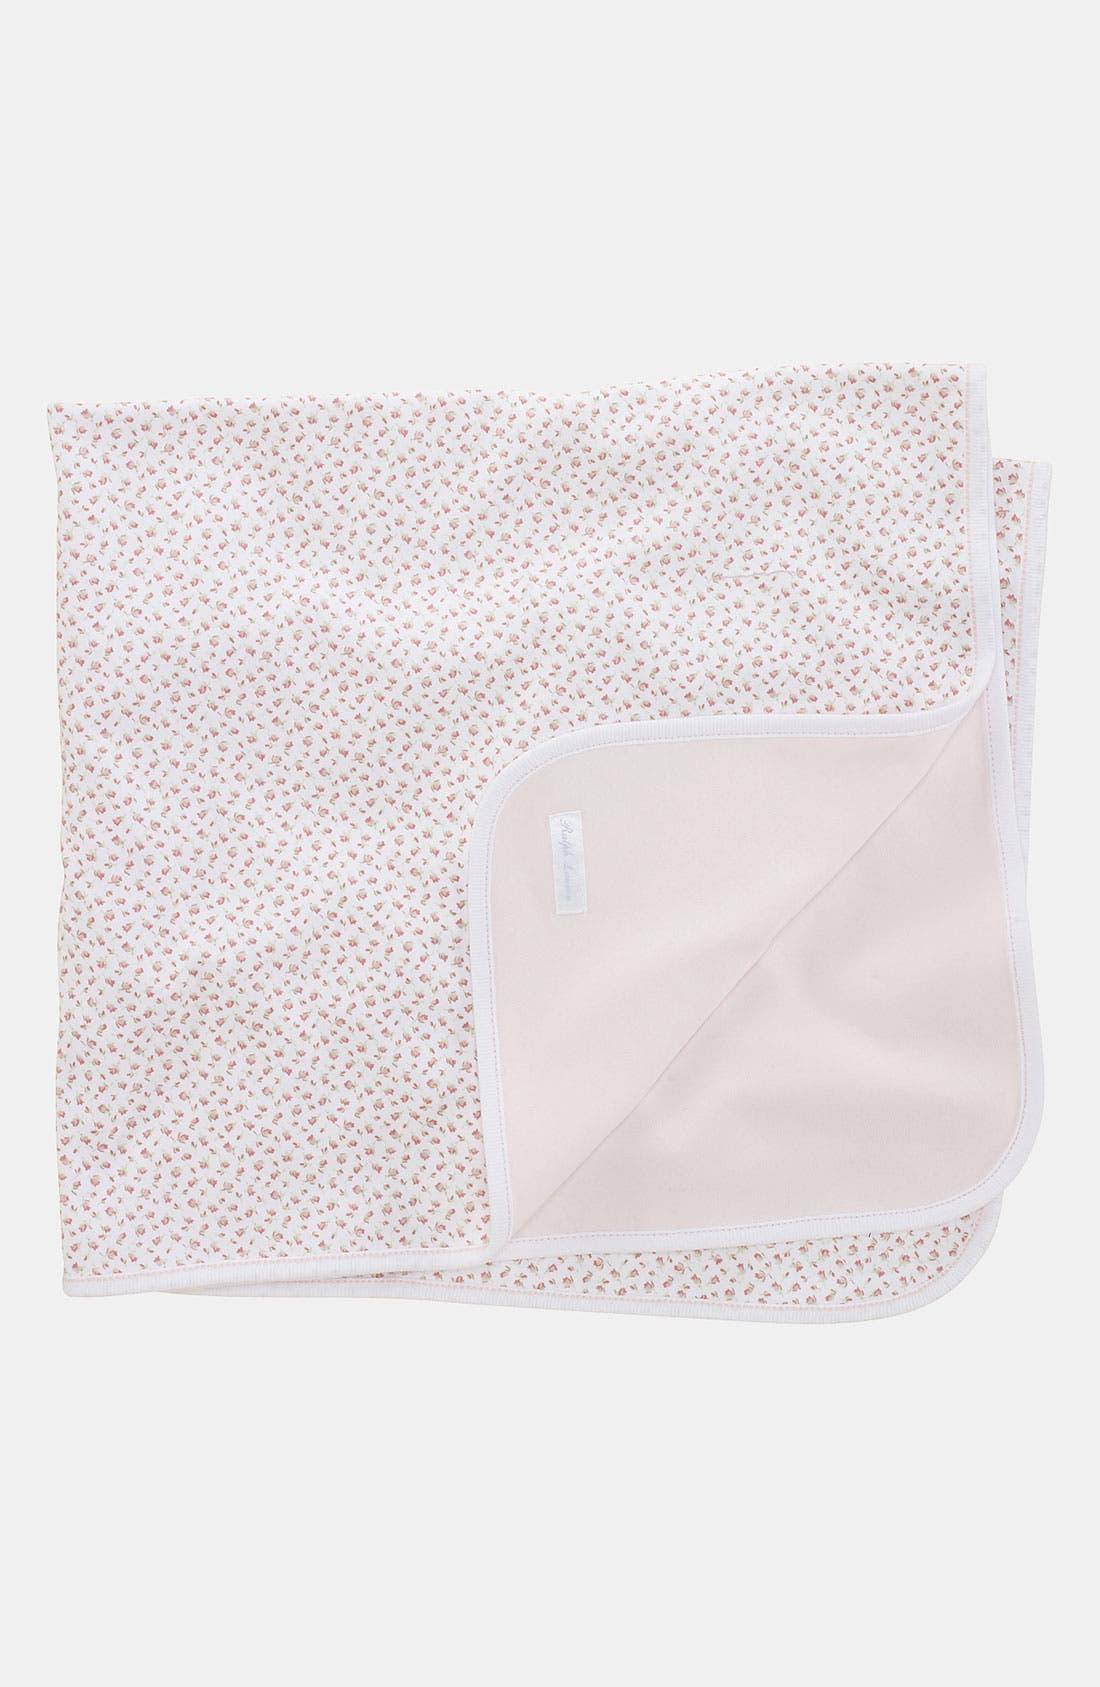 Reversible Receiving Blanket,                         Main,                         color, 100